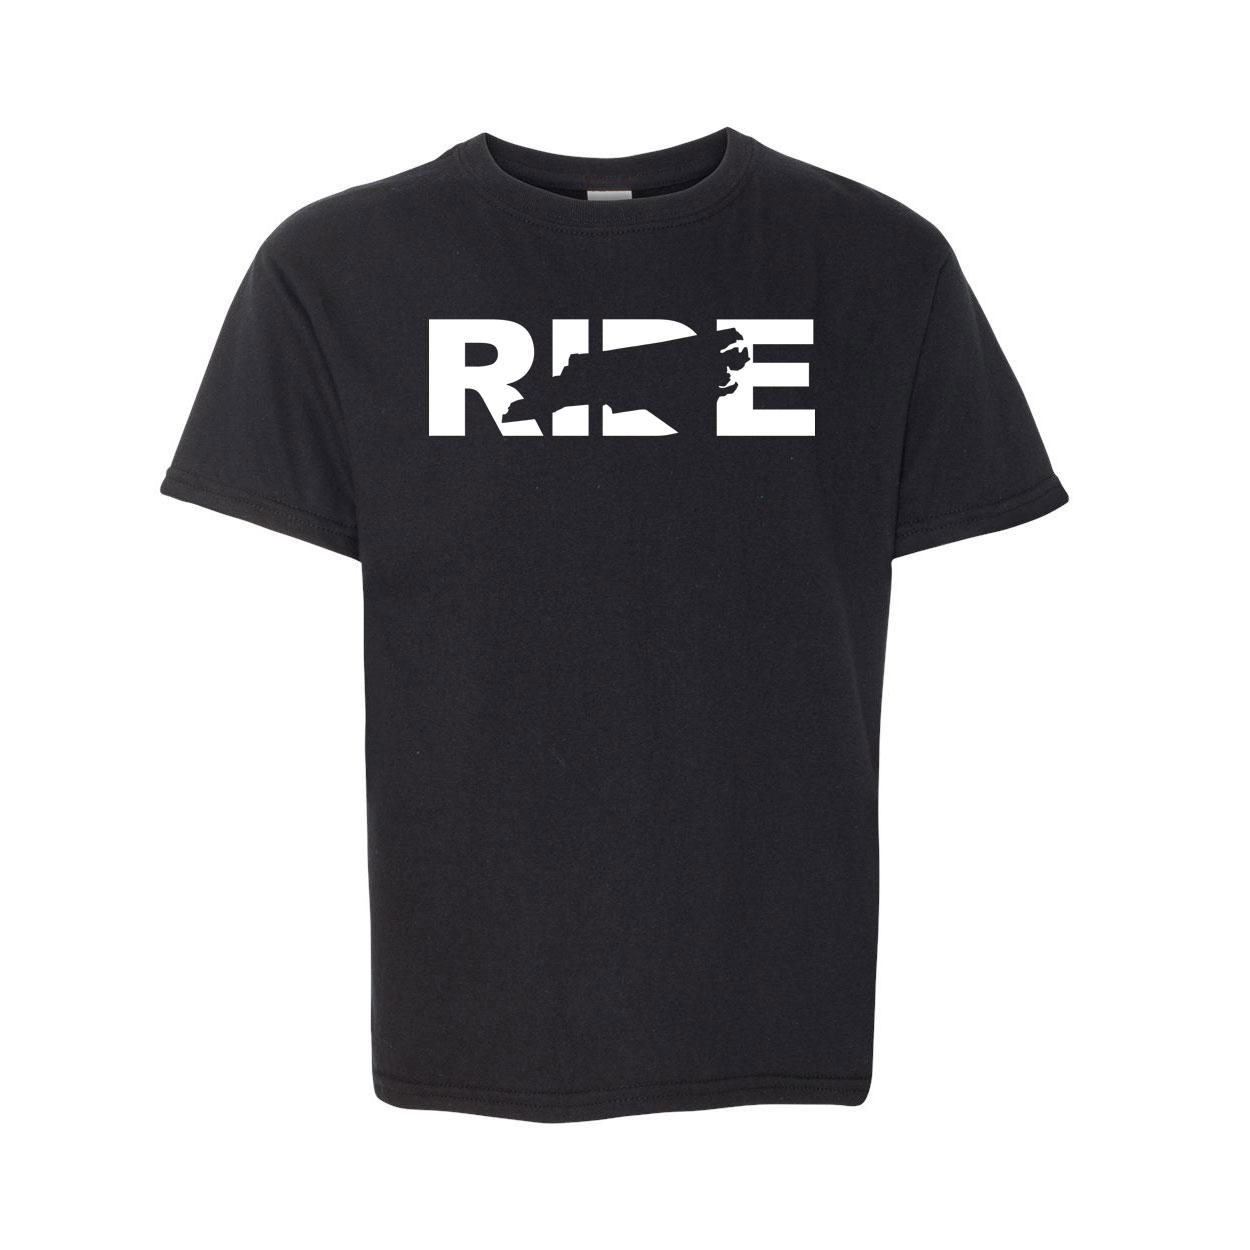 Ride North Carolina Classic Youth T-Shirt Black (White Logo)